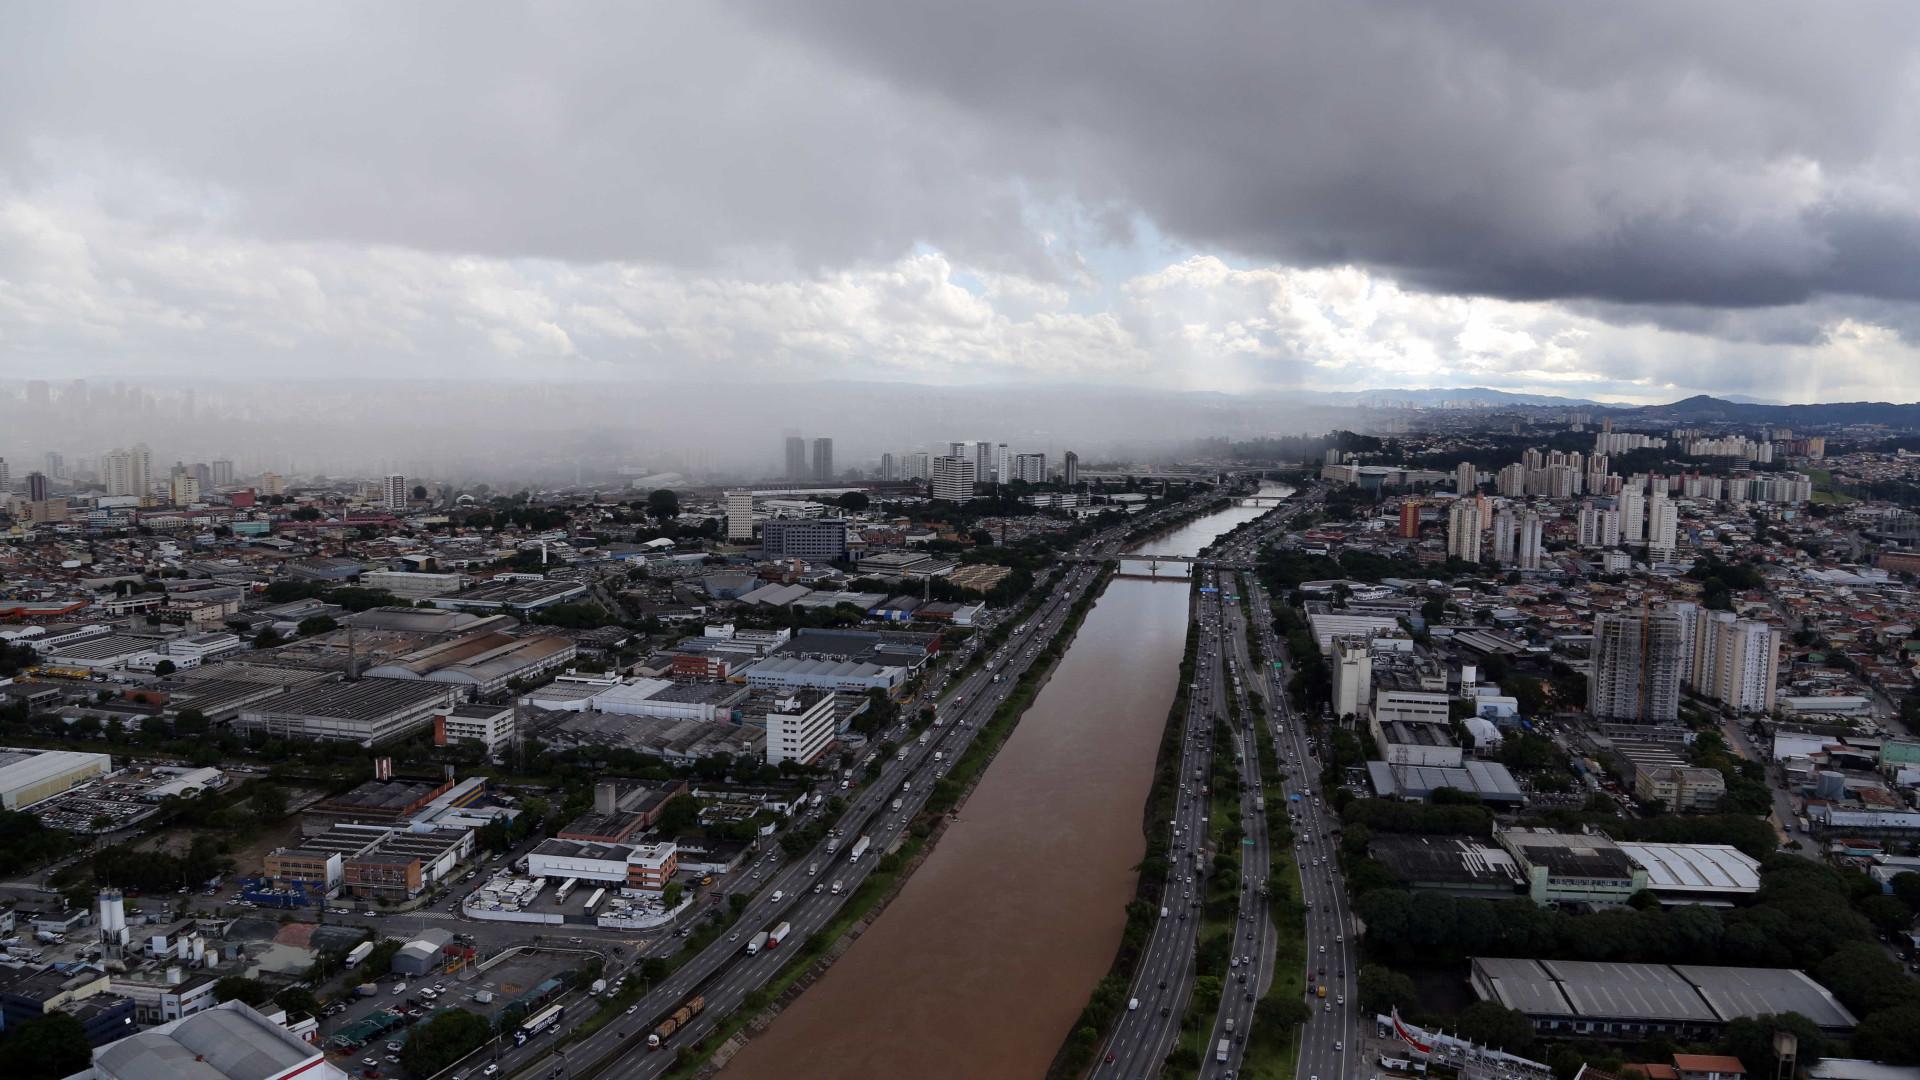 Semana terá calor e pancadas de chuva na capital paulista